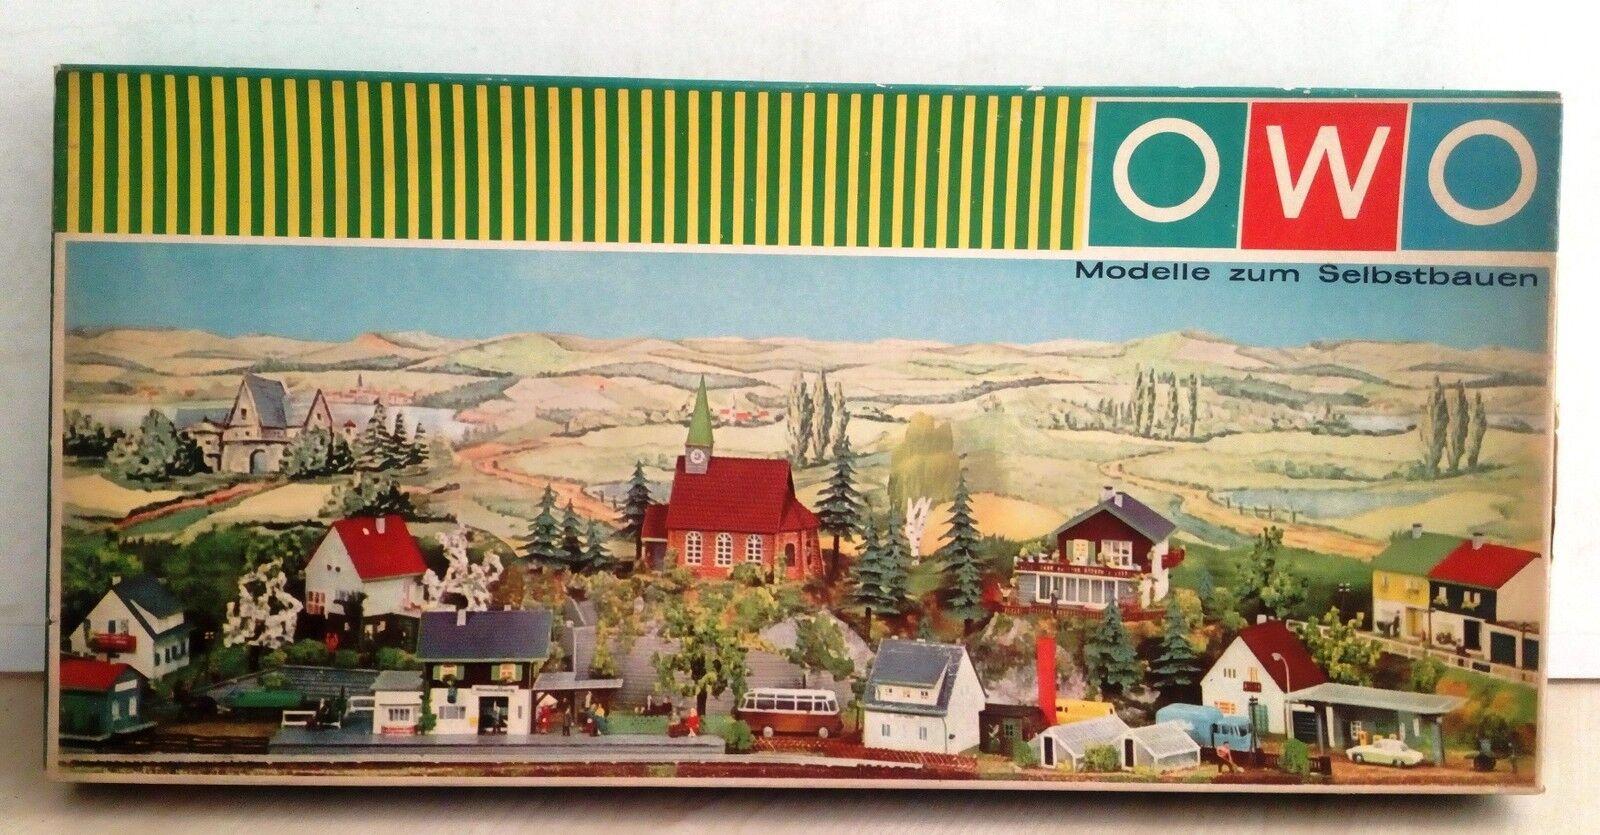 66389 Kit di montaggio OWO nr. 9622 129-1807 - Diorama Stazione BHF. SCHLOßERG